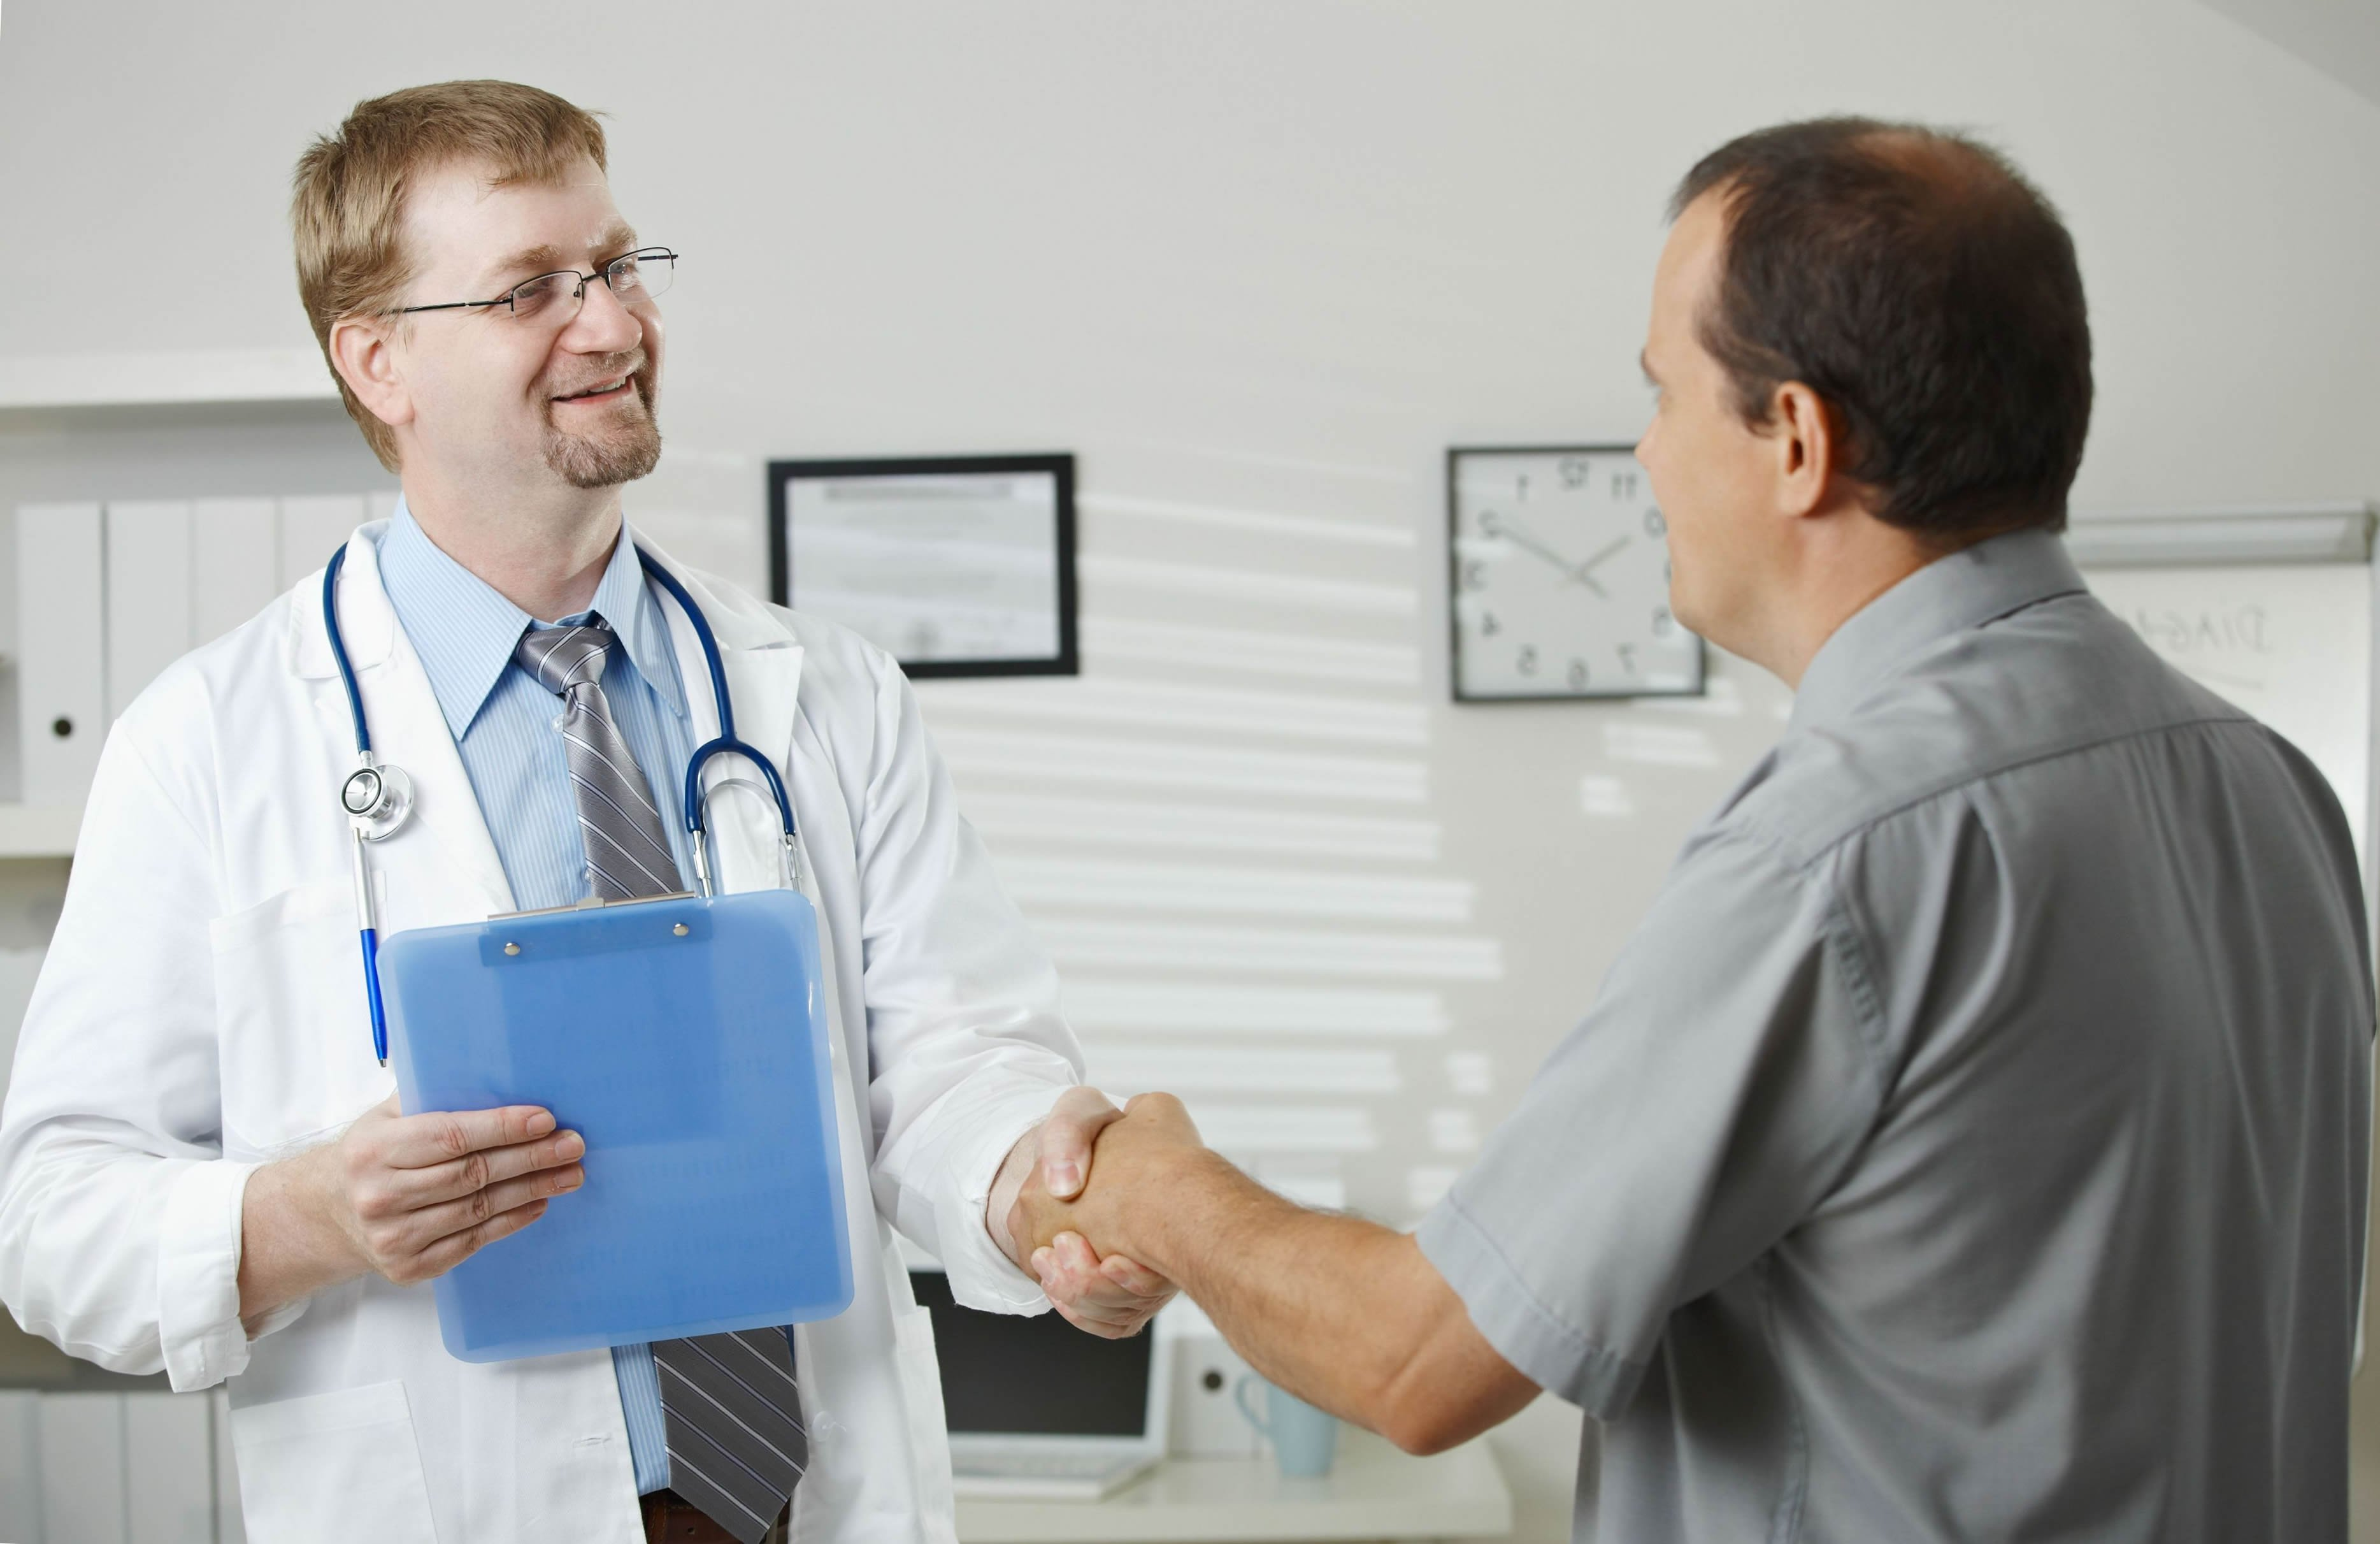 Приём врача гинеколога фото 19 фотография